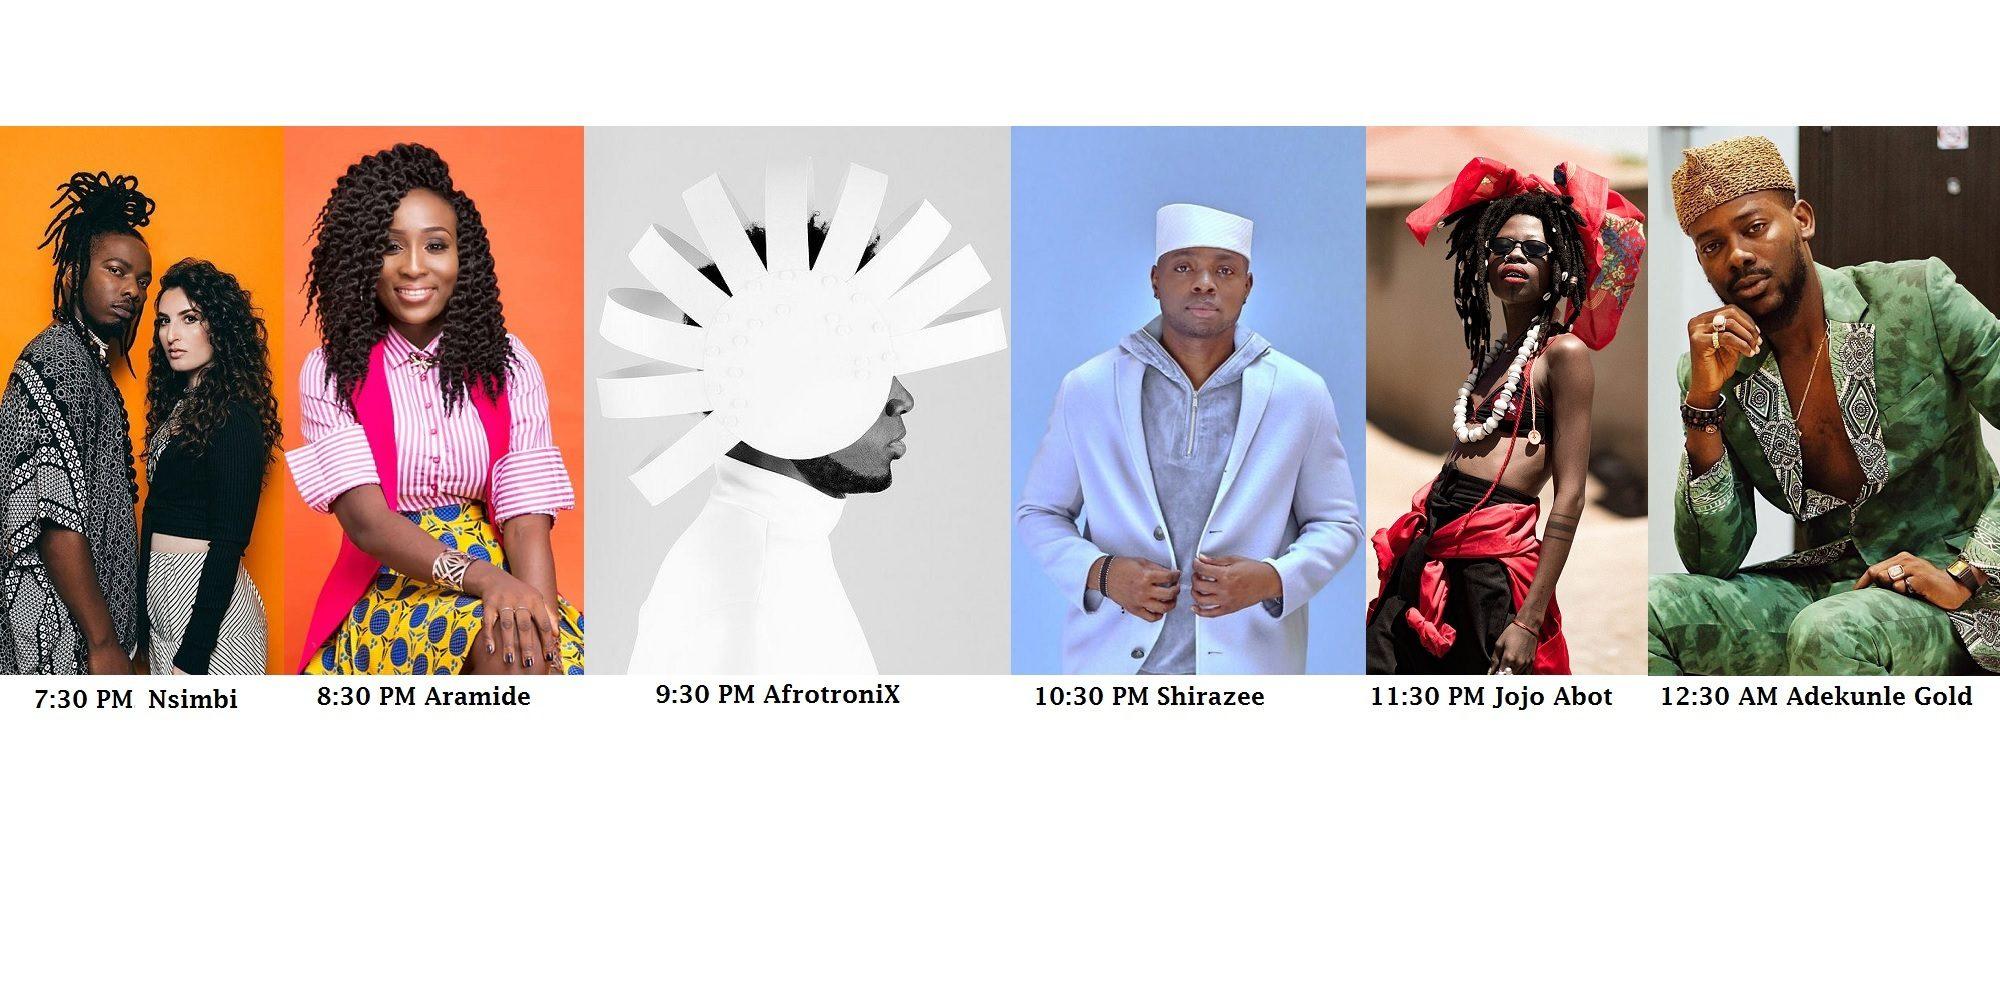 Meet the Artists of Afropop Worldwide's SXSW Showcase